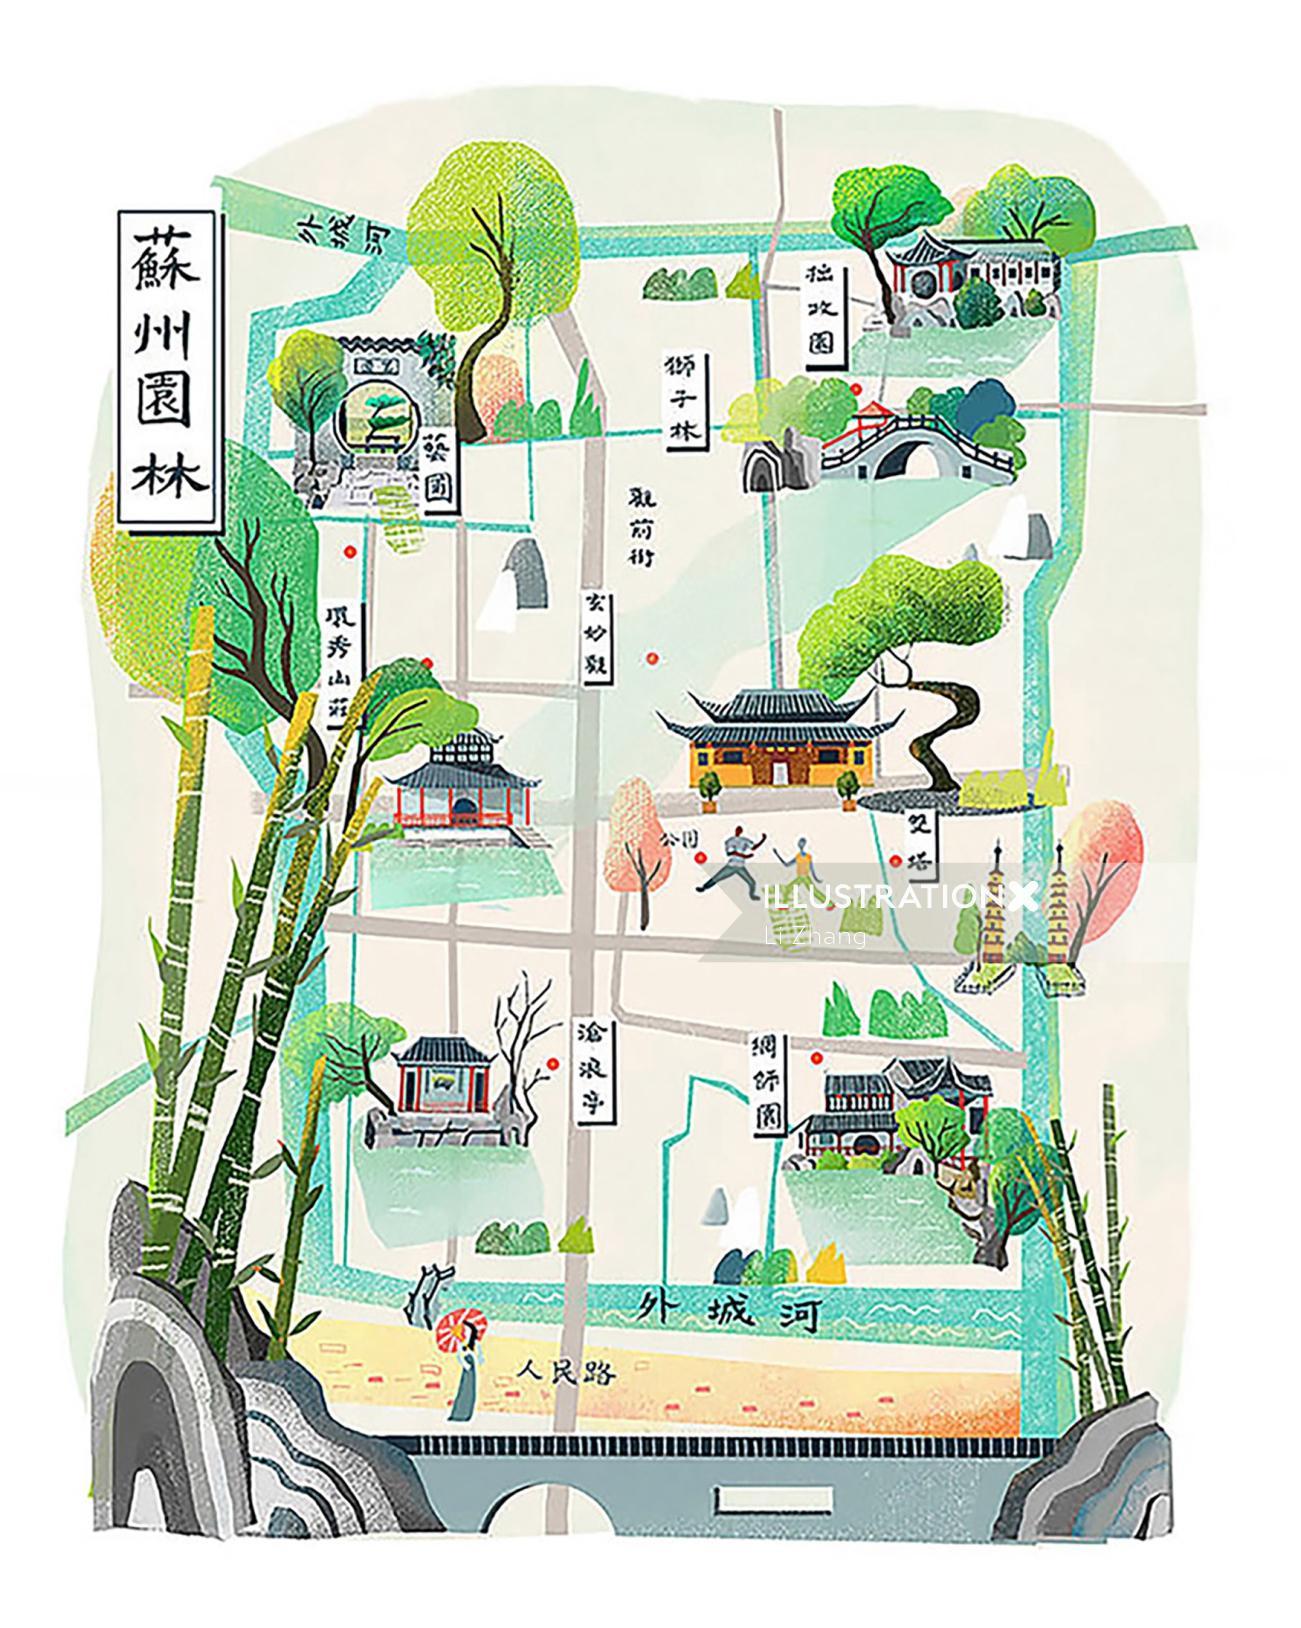 Map illustration of Suzhou Gardens